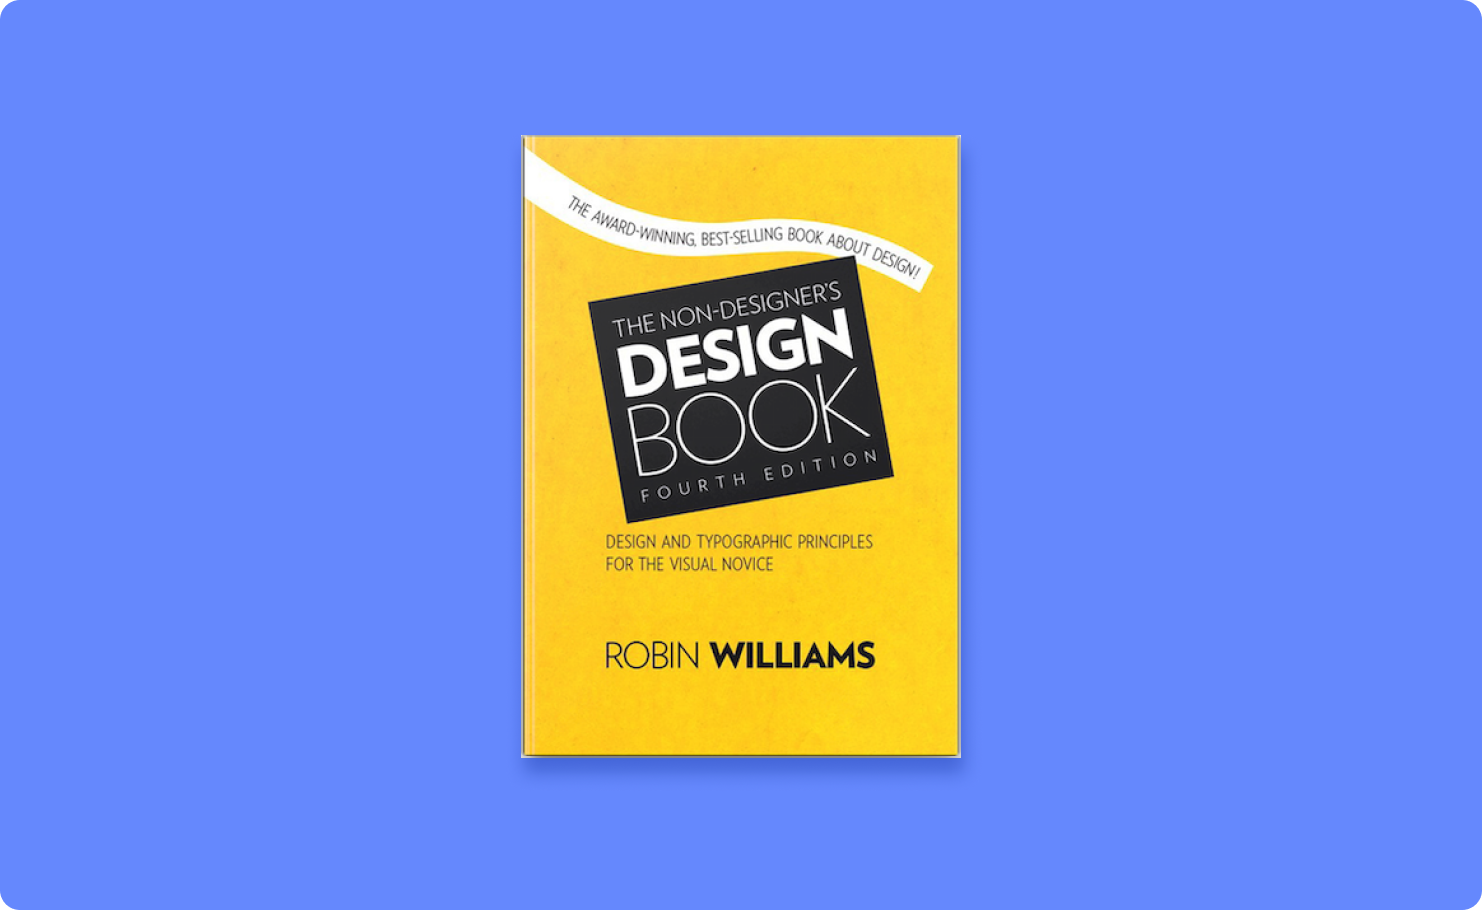 Cover image of the book: The Non-Designer´s Book